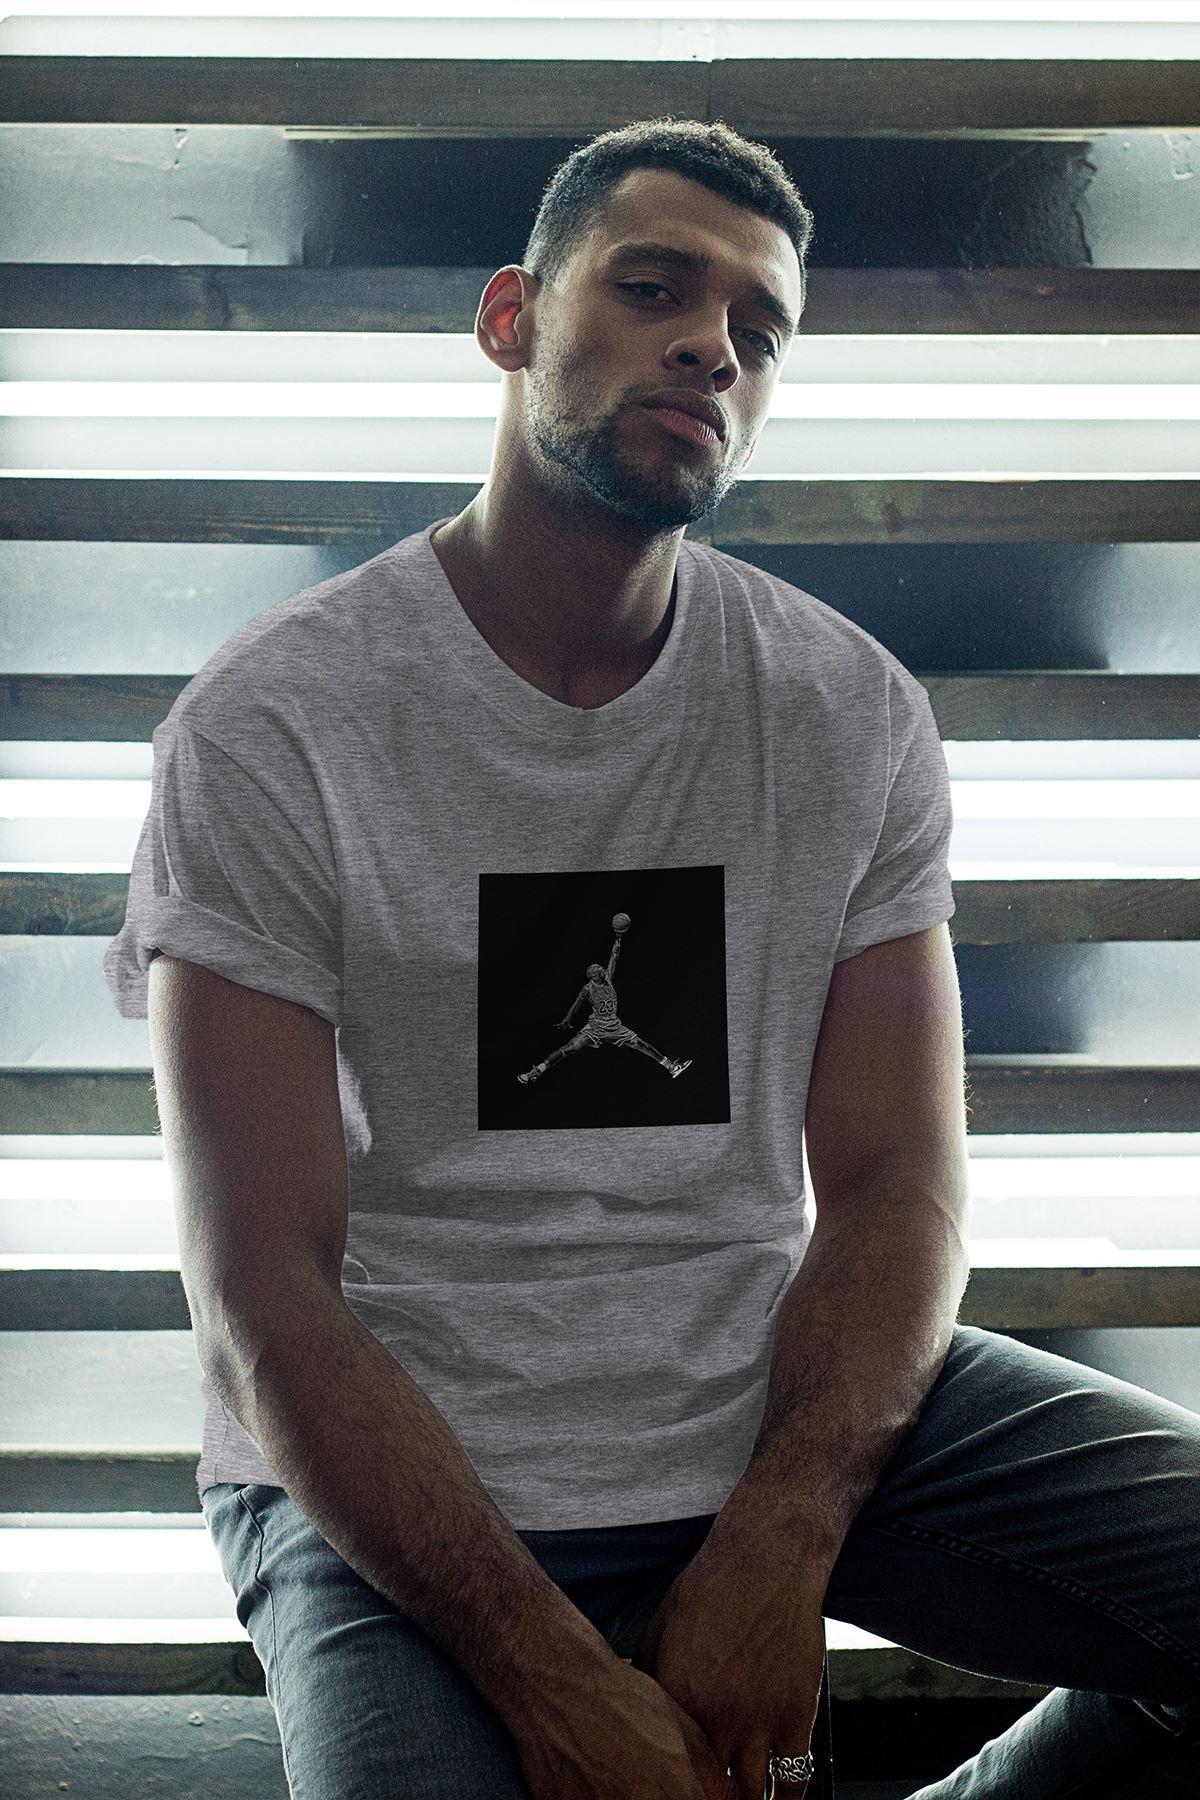 JumpMan Black Fon Gri Erkek Oversize Tshirt - Tişört